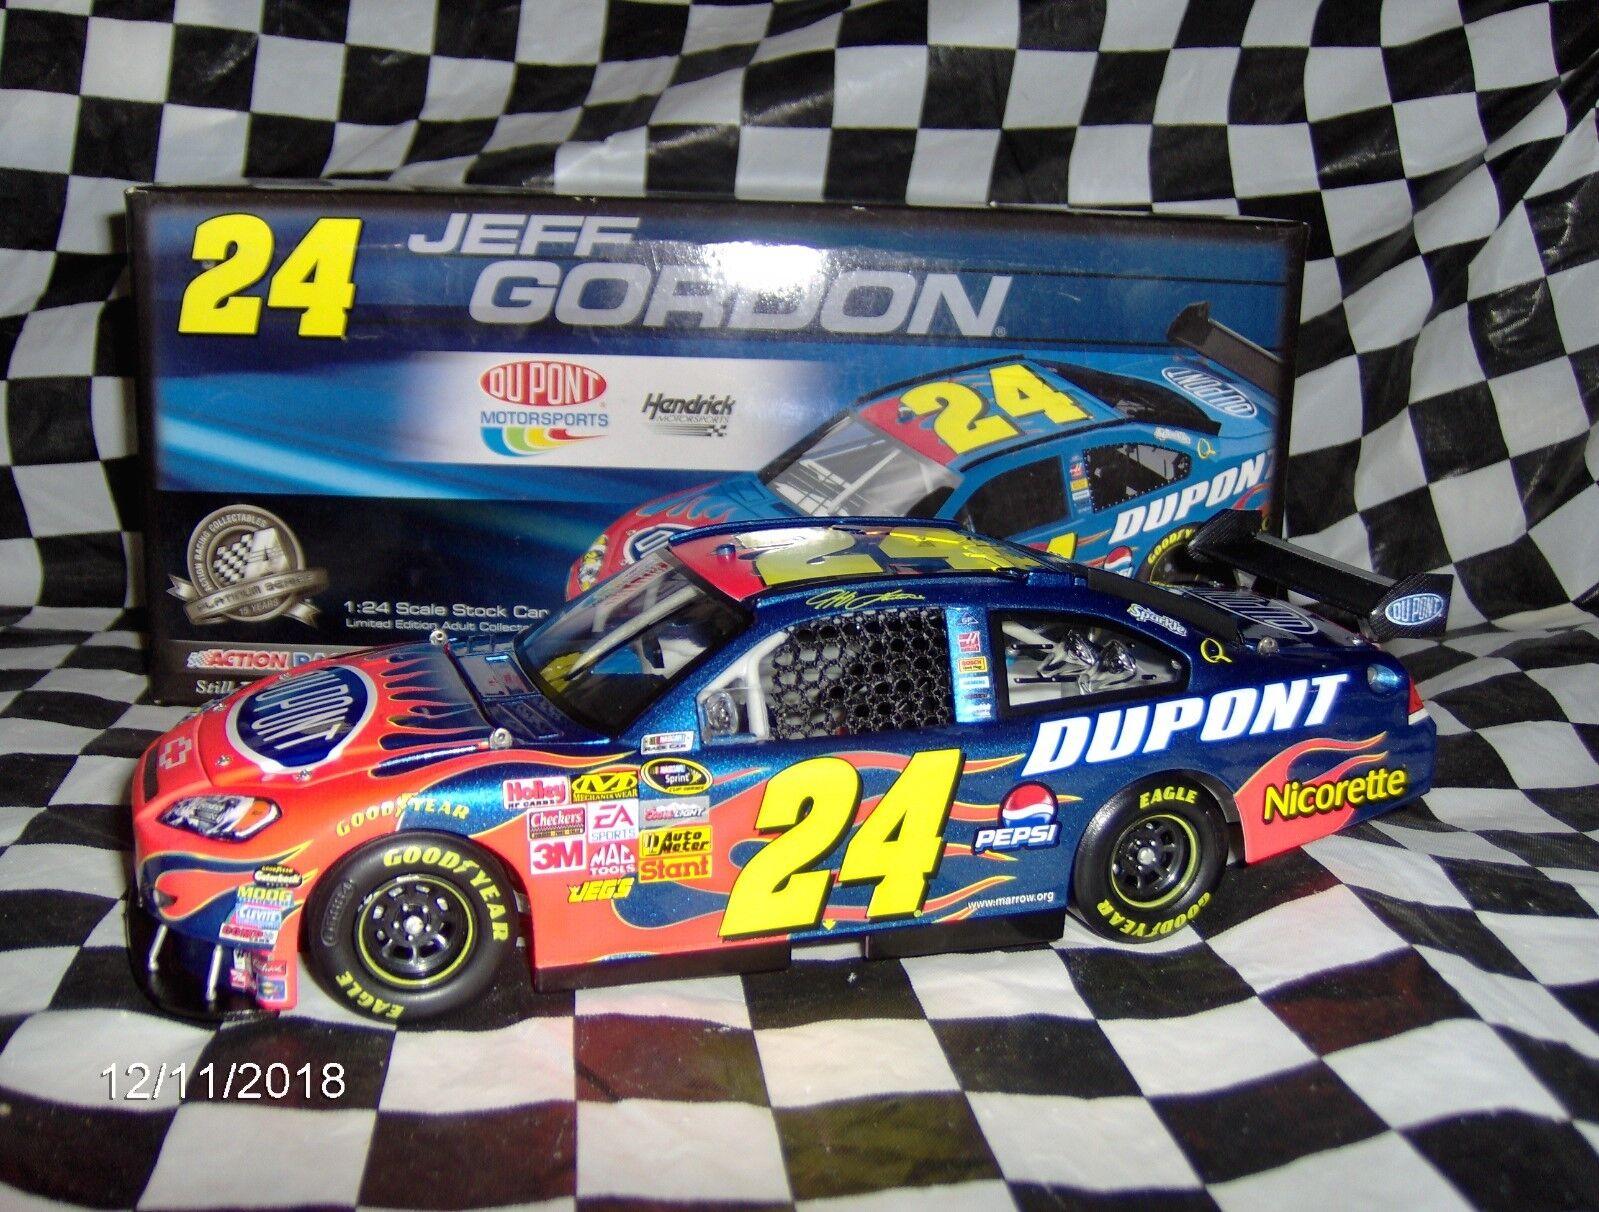 2008 Jeff Gordon Dupont 1 24th